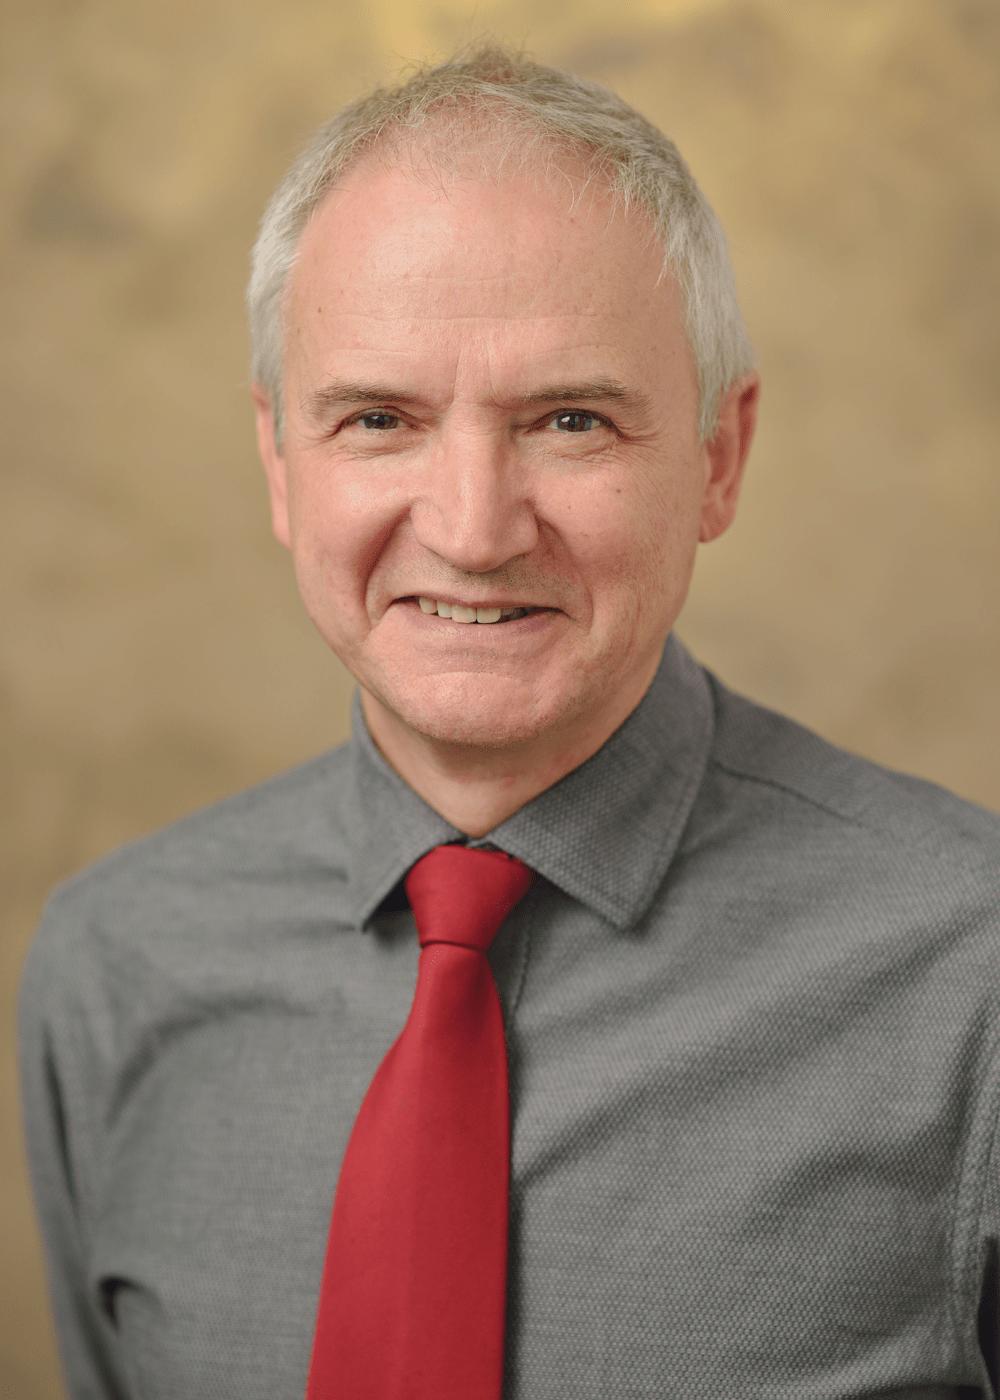 Peter Openshaw